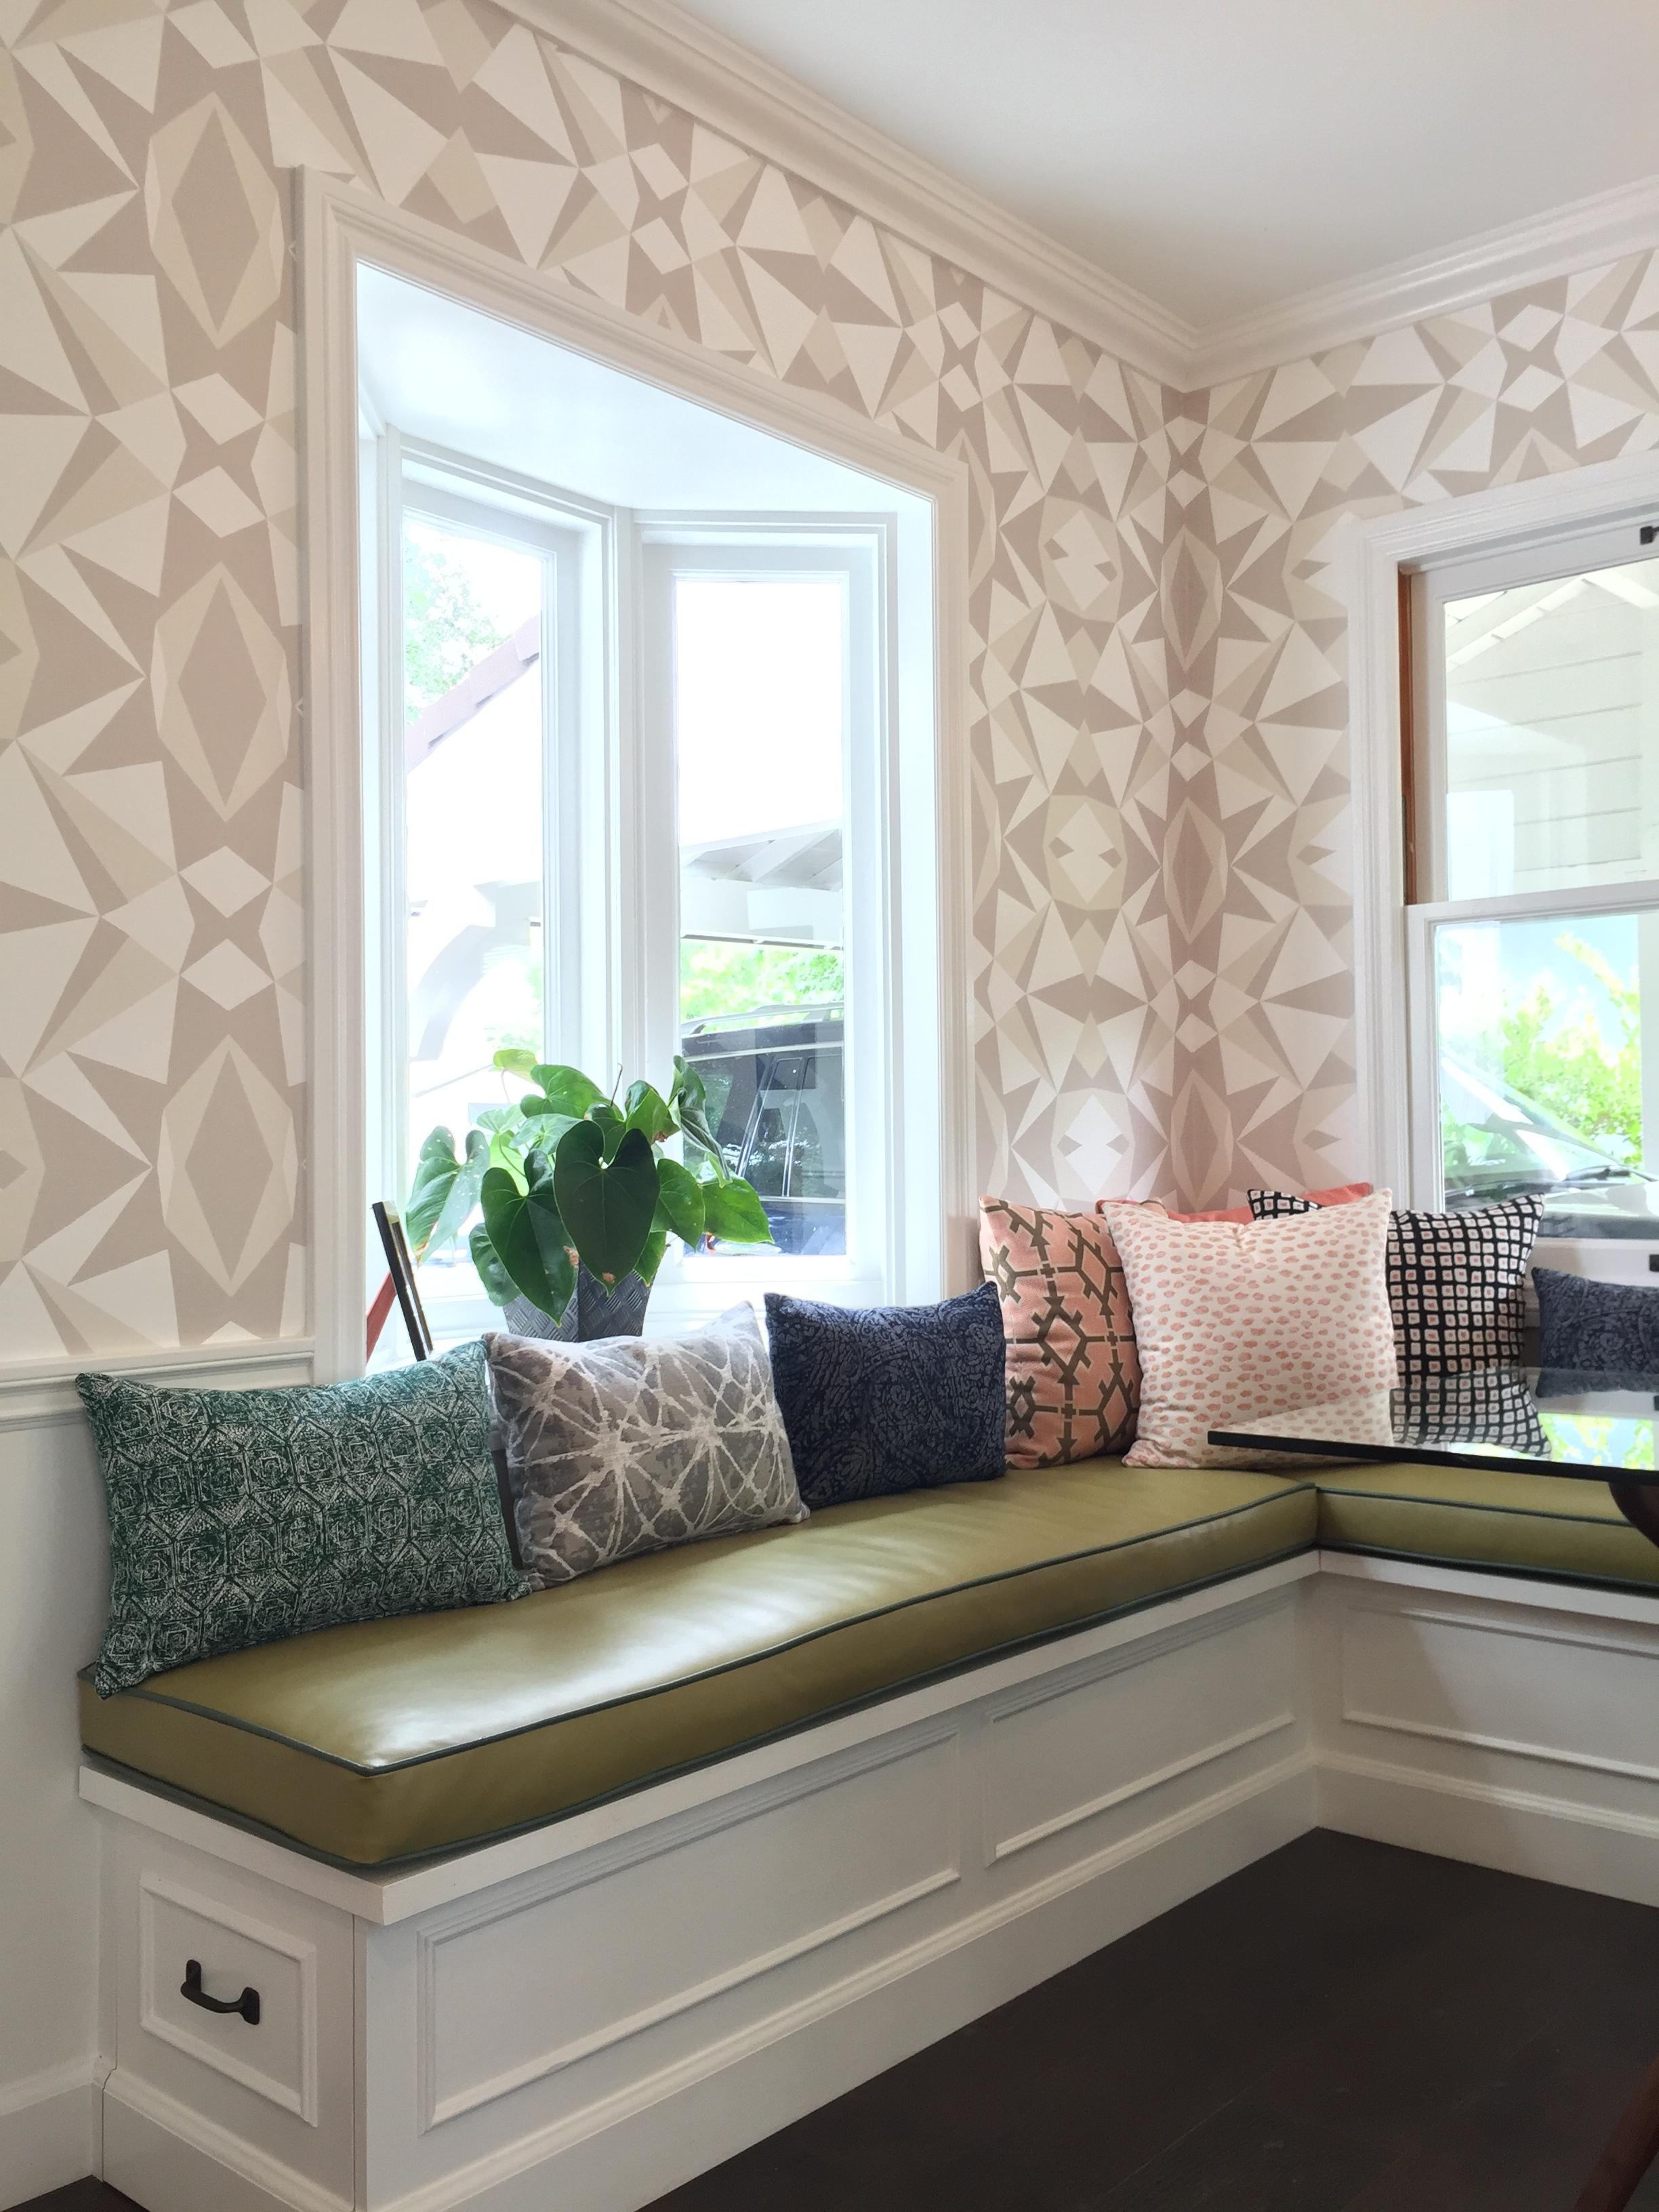 MOSAIC PRINT IN NATURAL Designer: Stone Textile